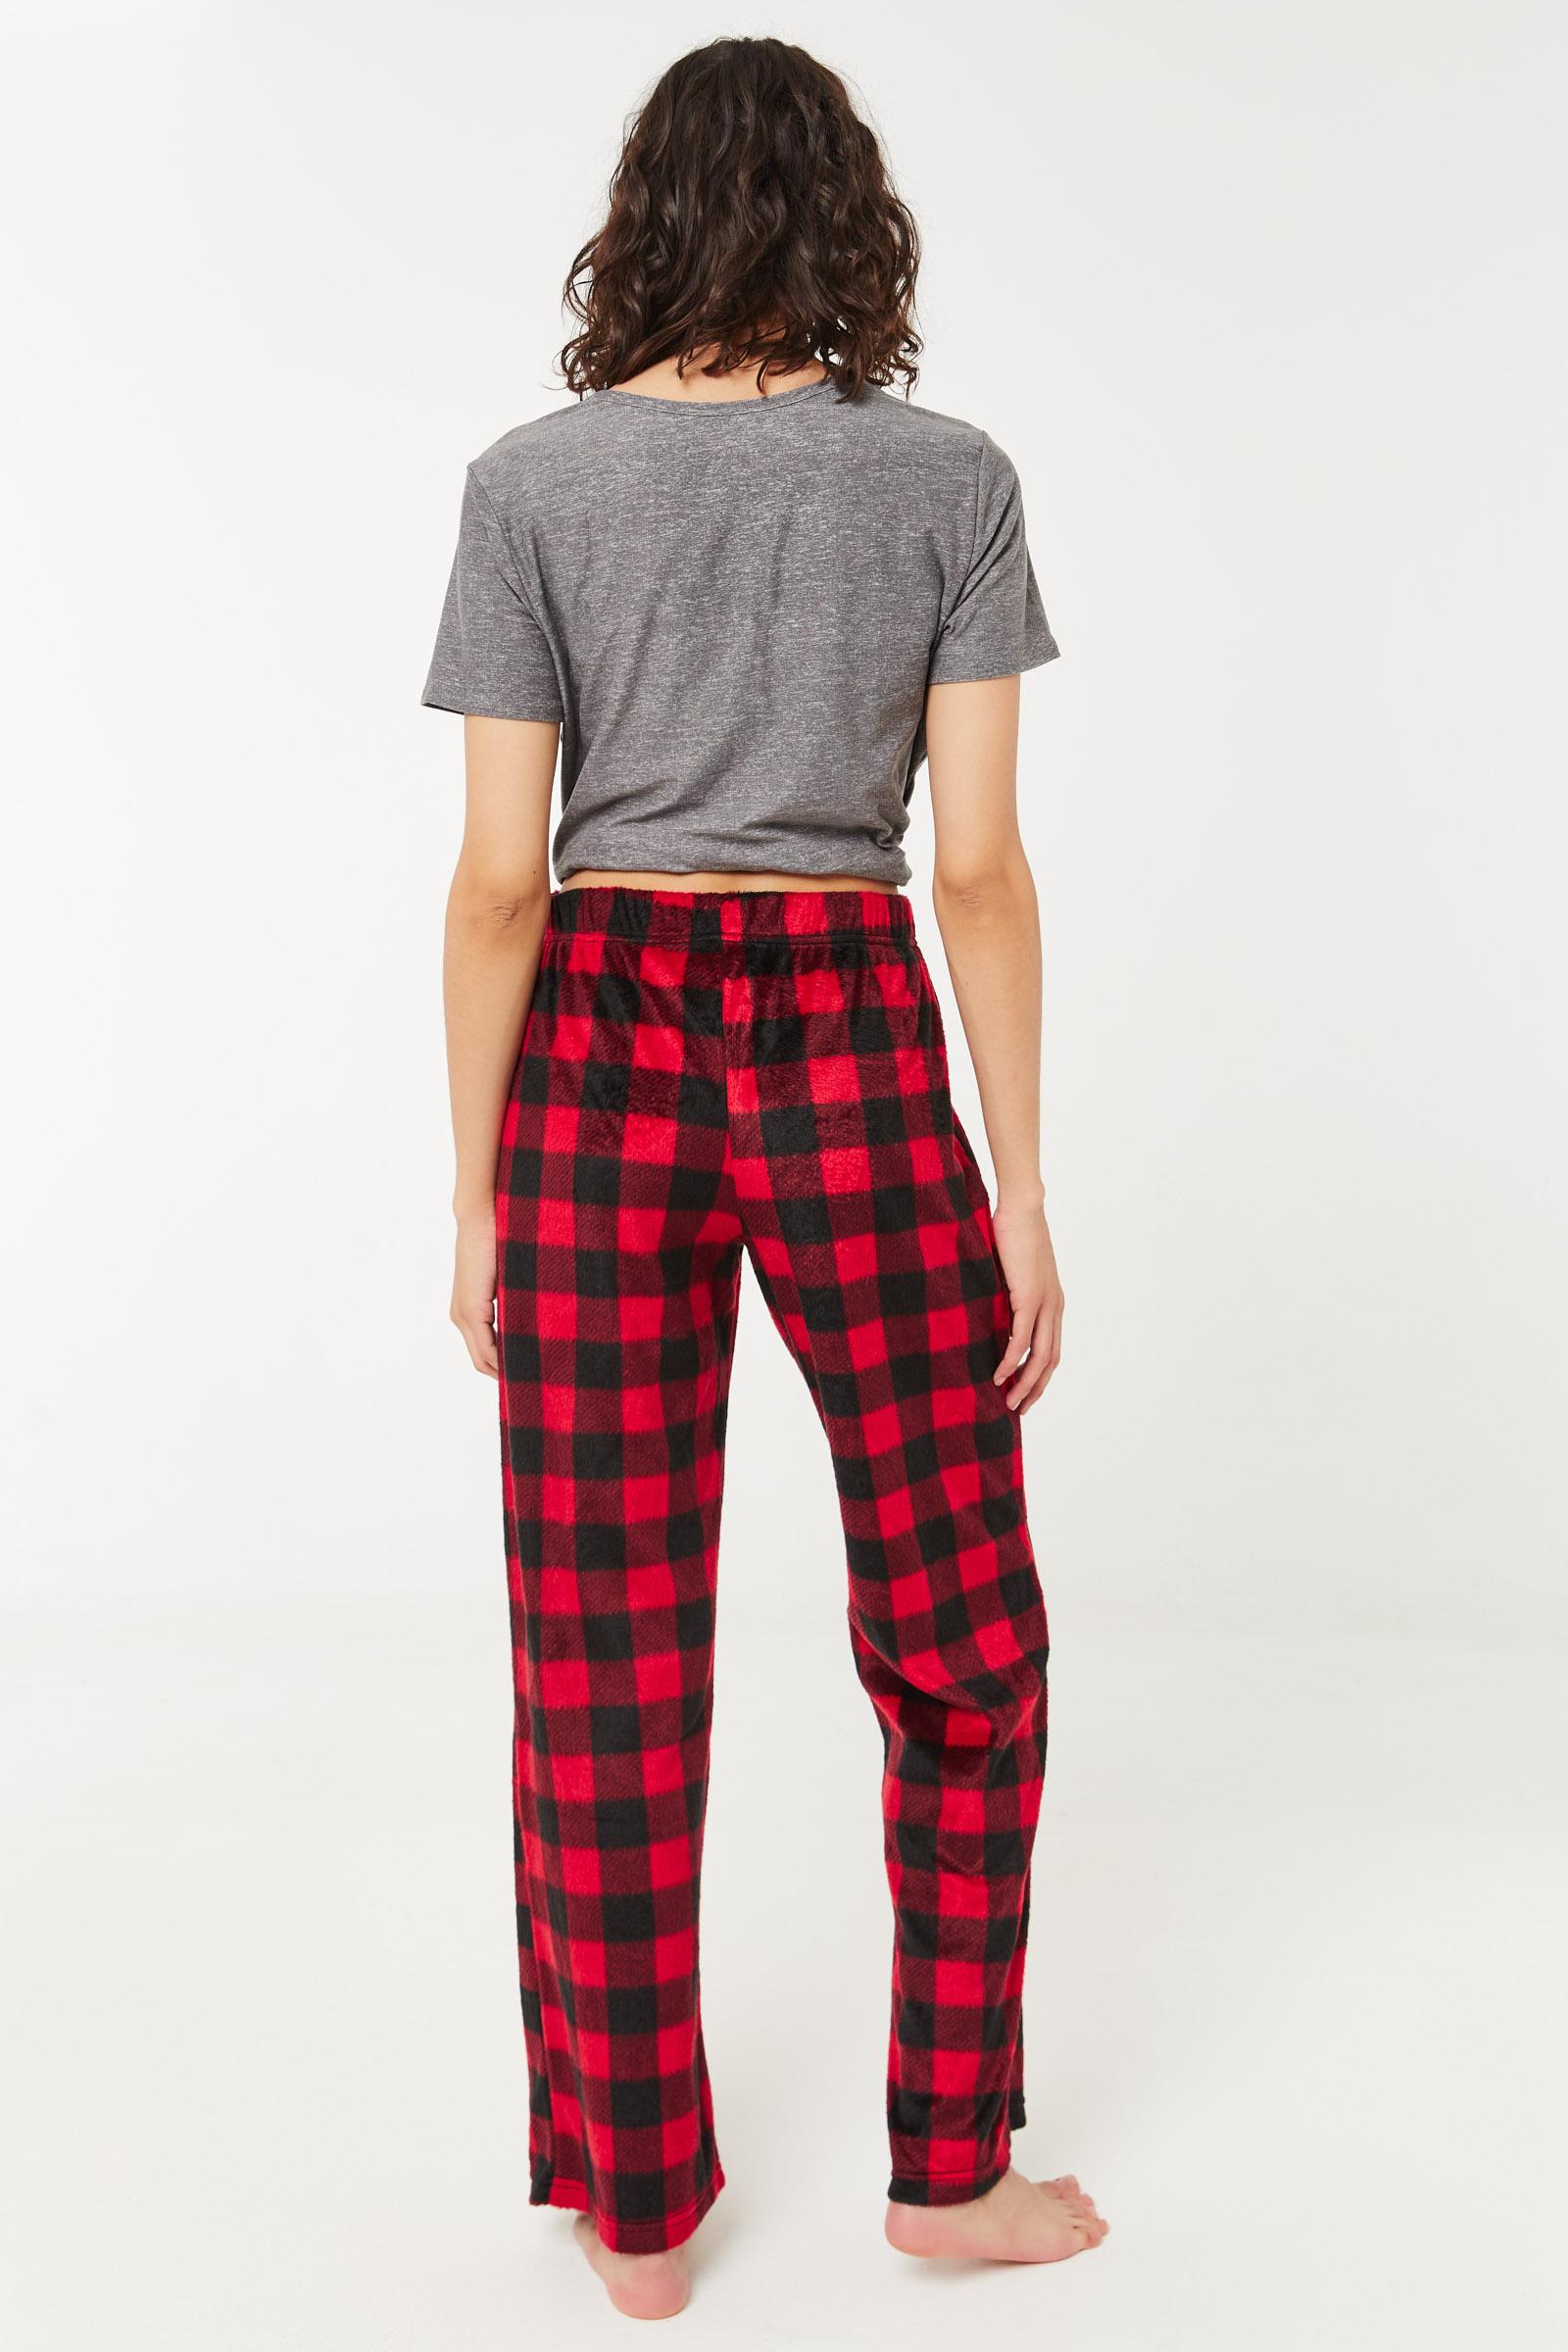 Bas de pyjama évasé à carreaux en minky